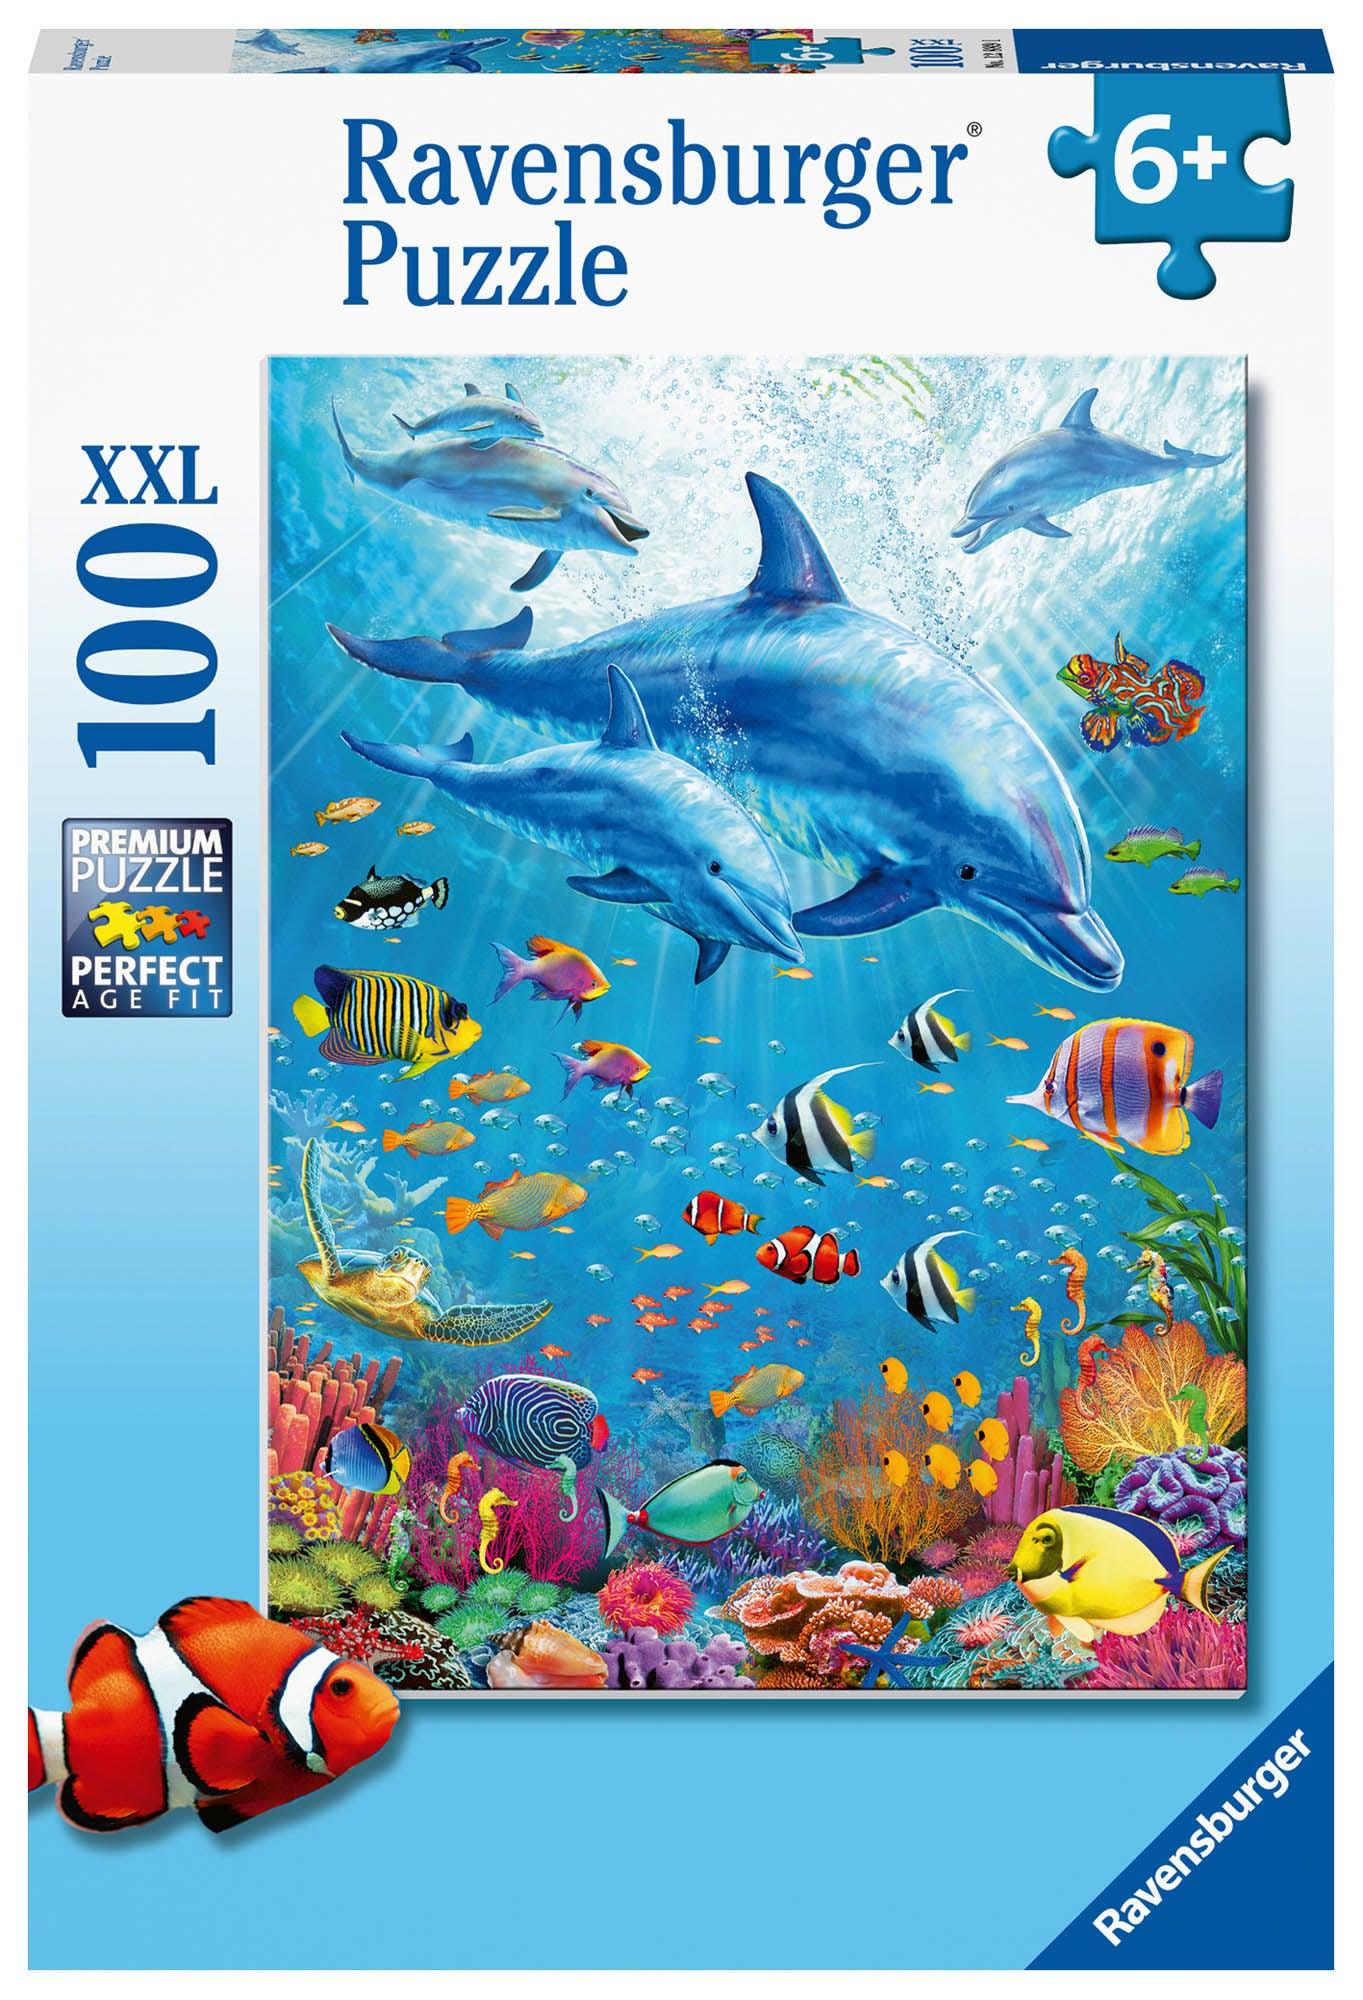 Ravensburger Pussel Delfiner 100 Bitar